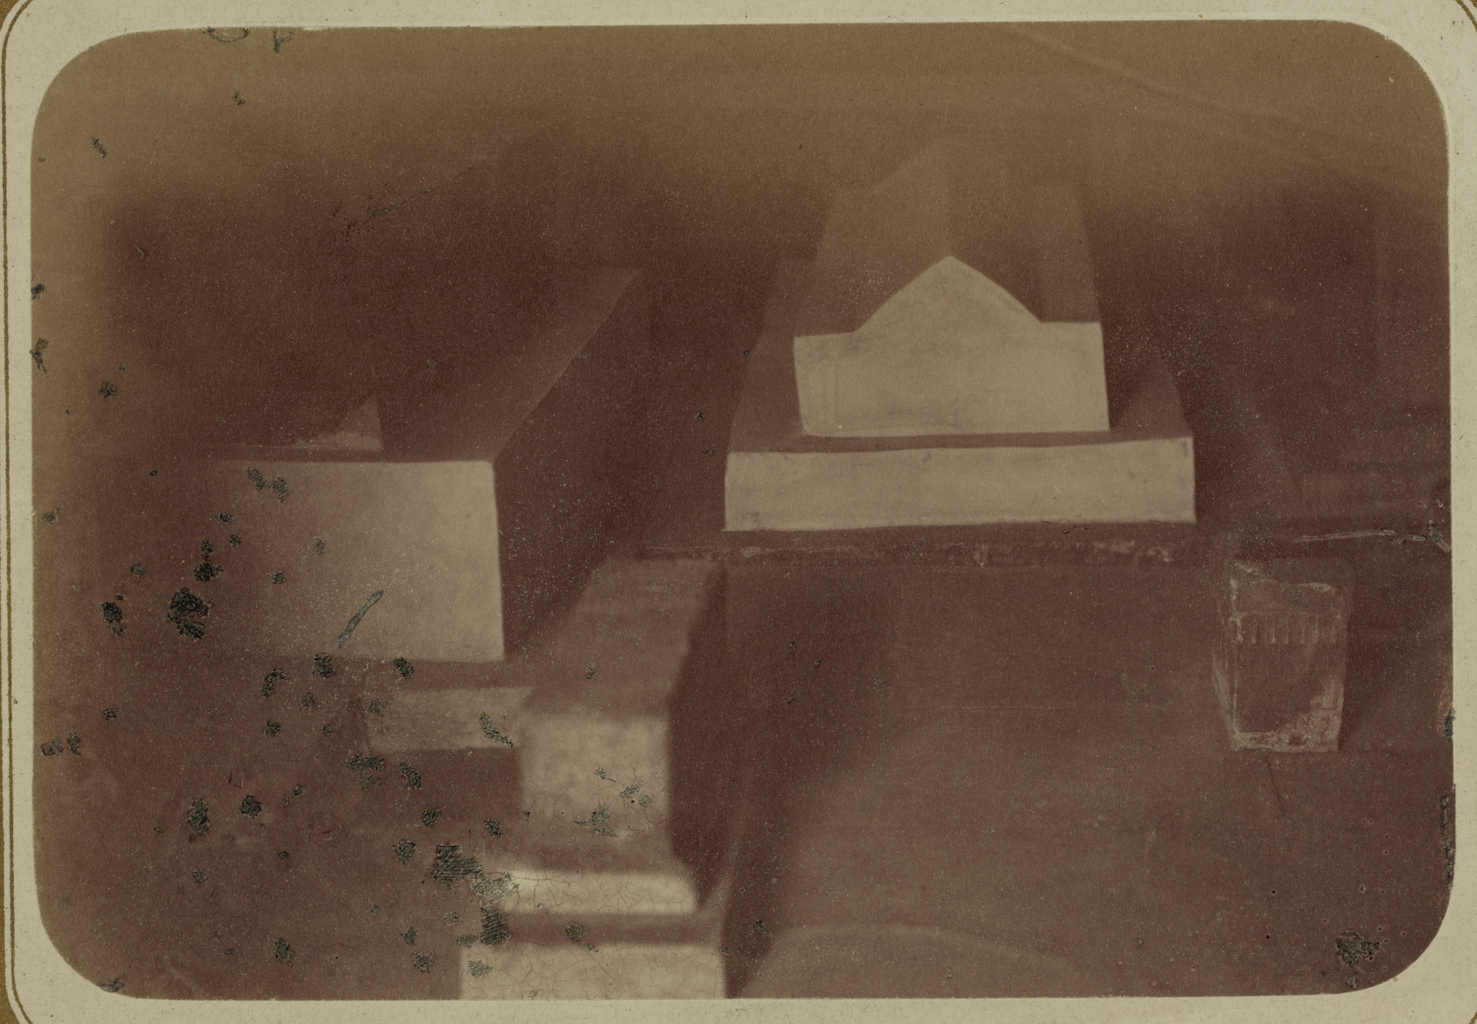 Мавзолей эмира Тимура Курагана (Гур-Эмир). Часть надгробного камня